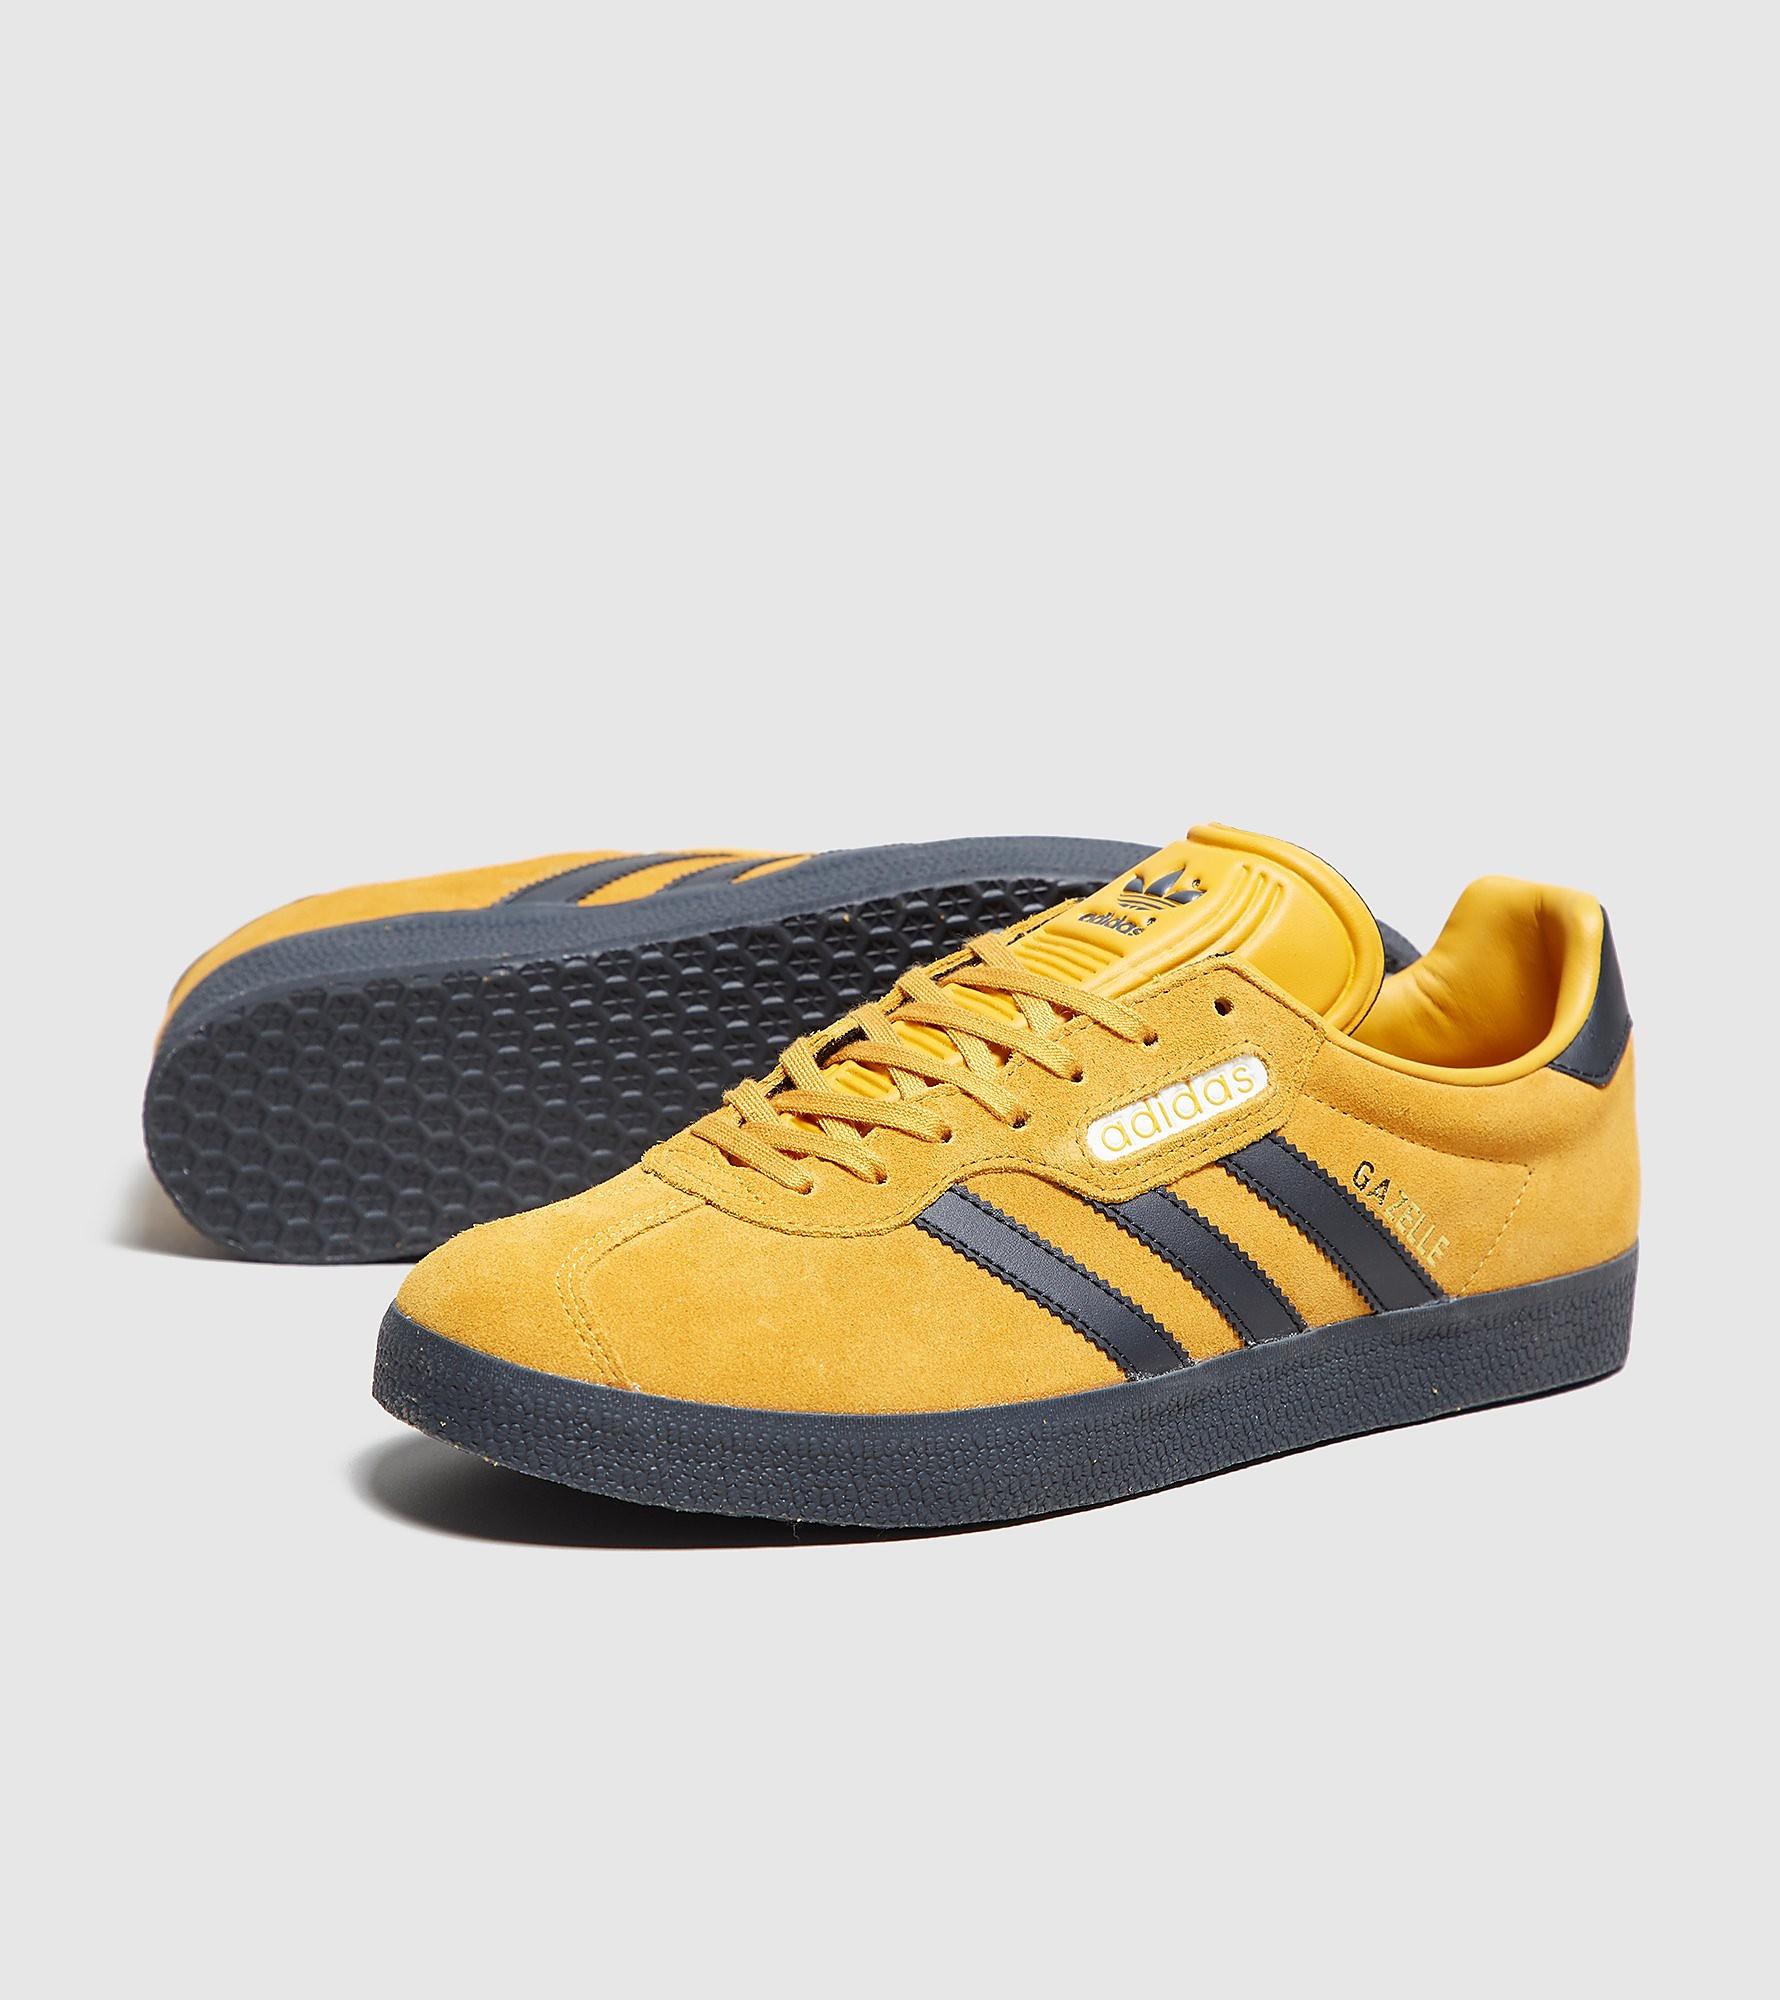 adidas Originals Gazelle Super